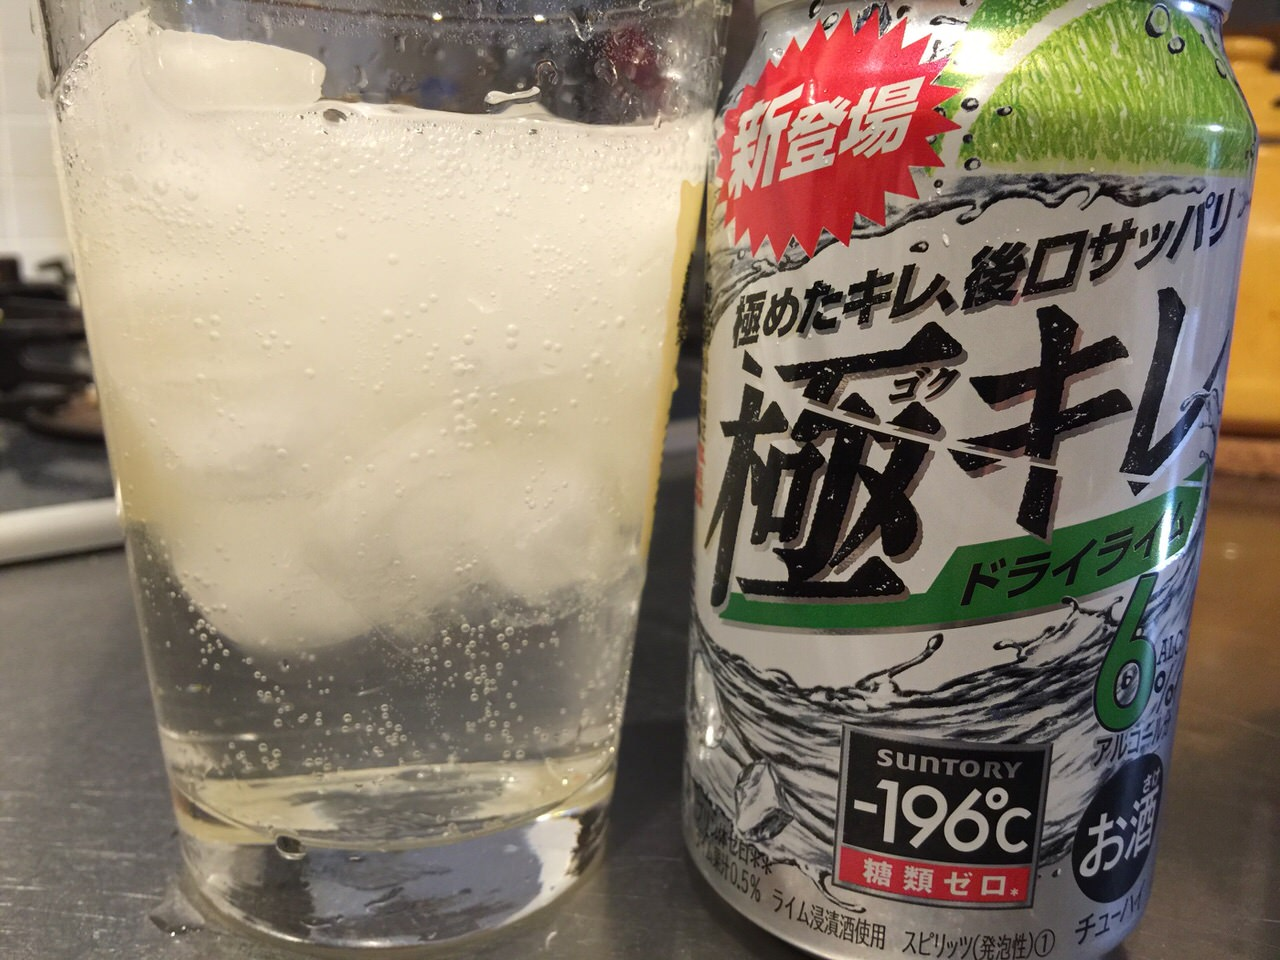 Gokukire 2785